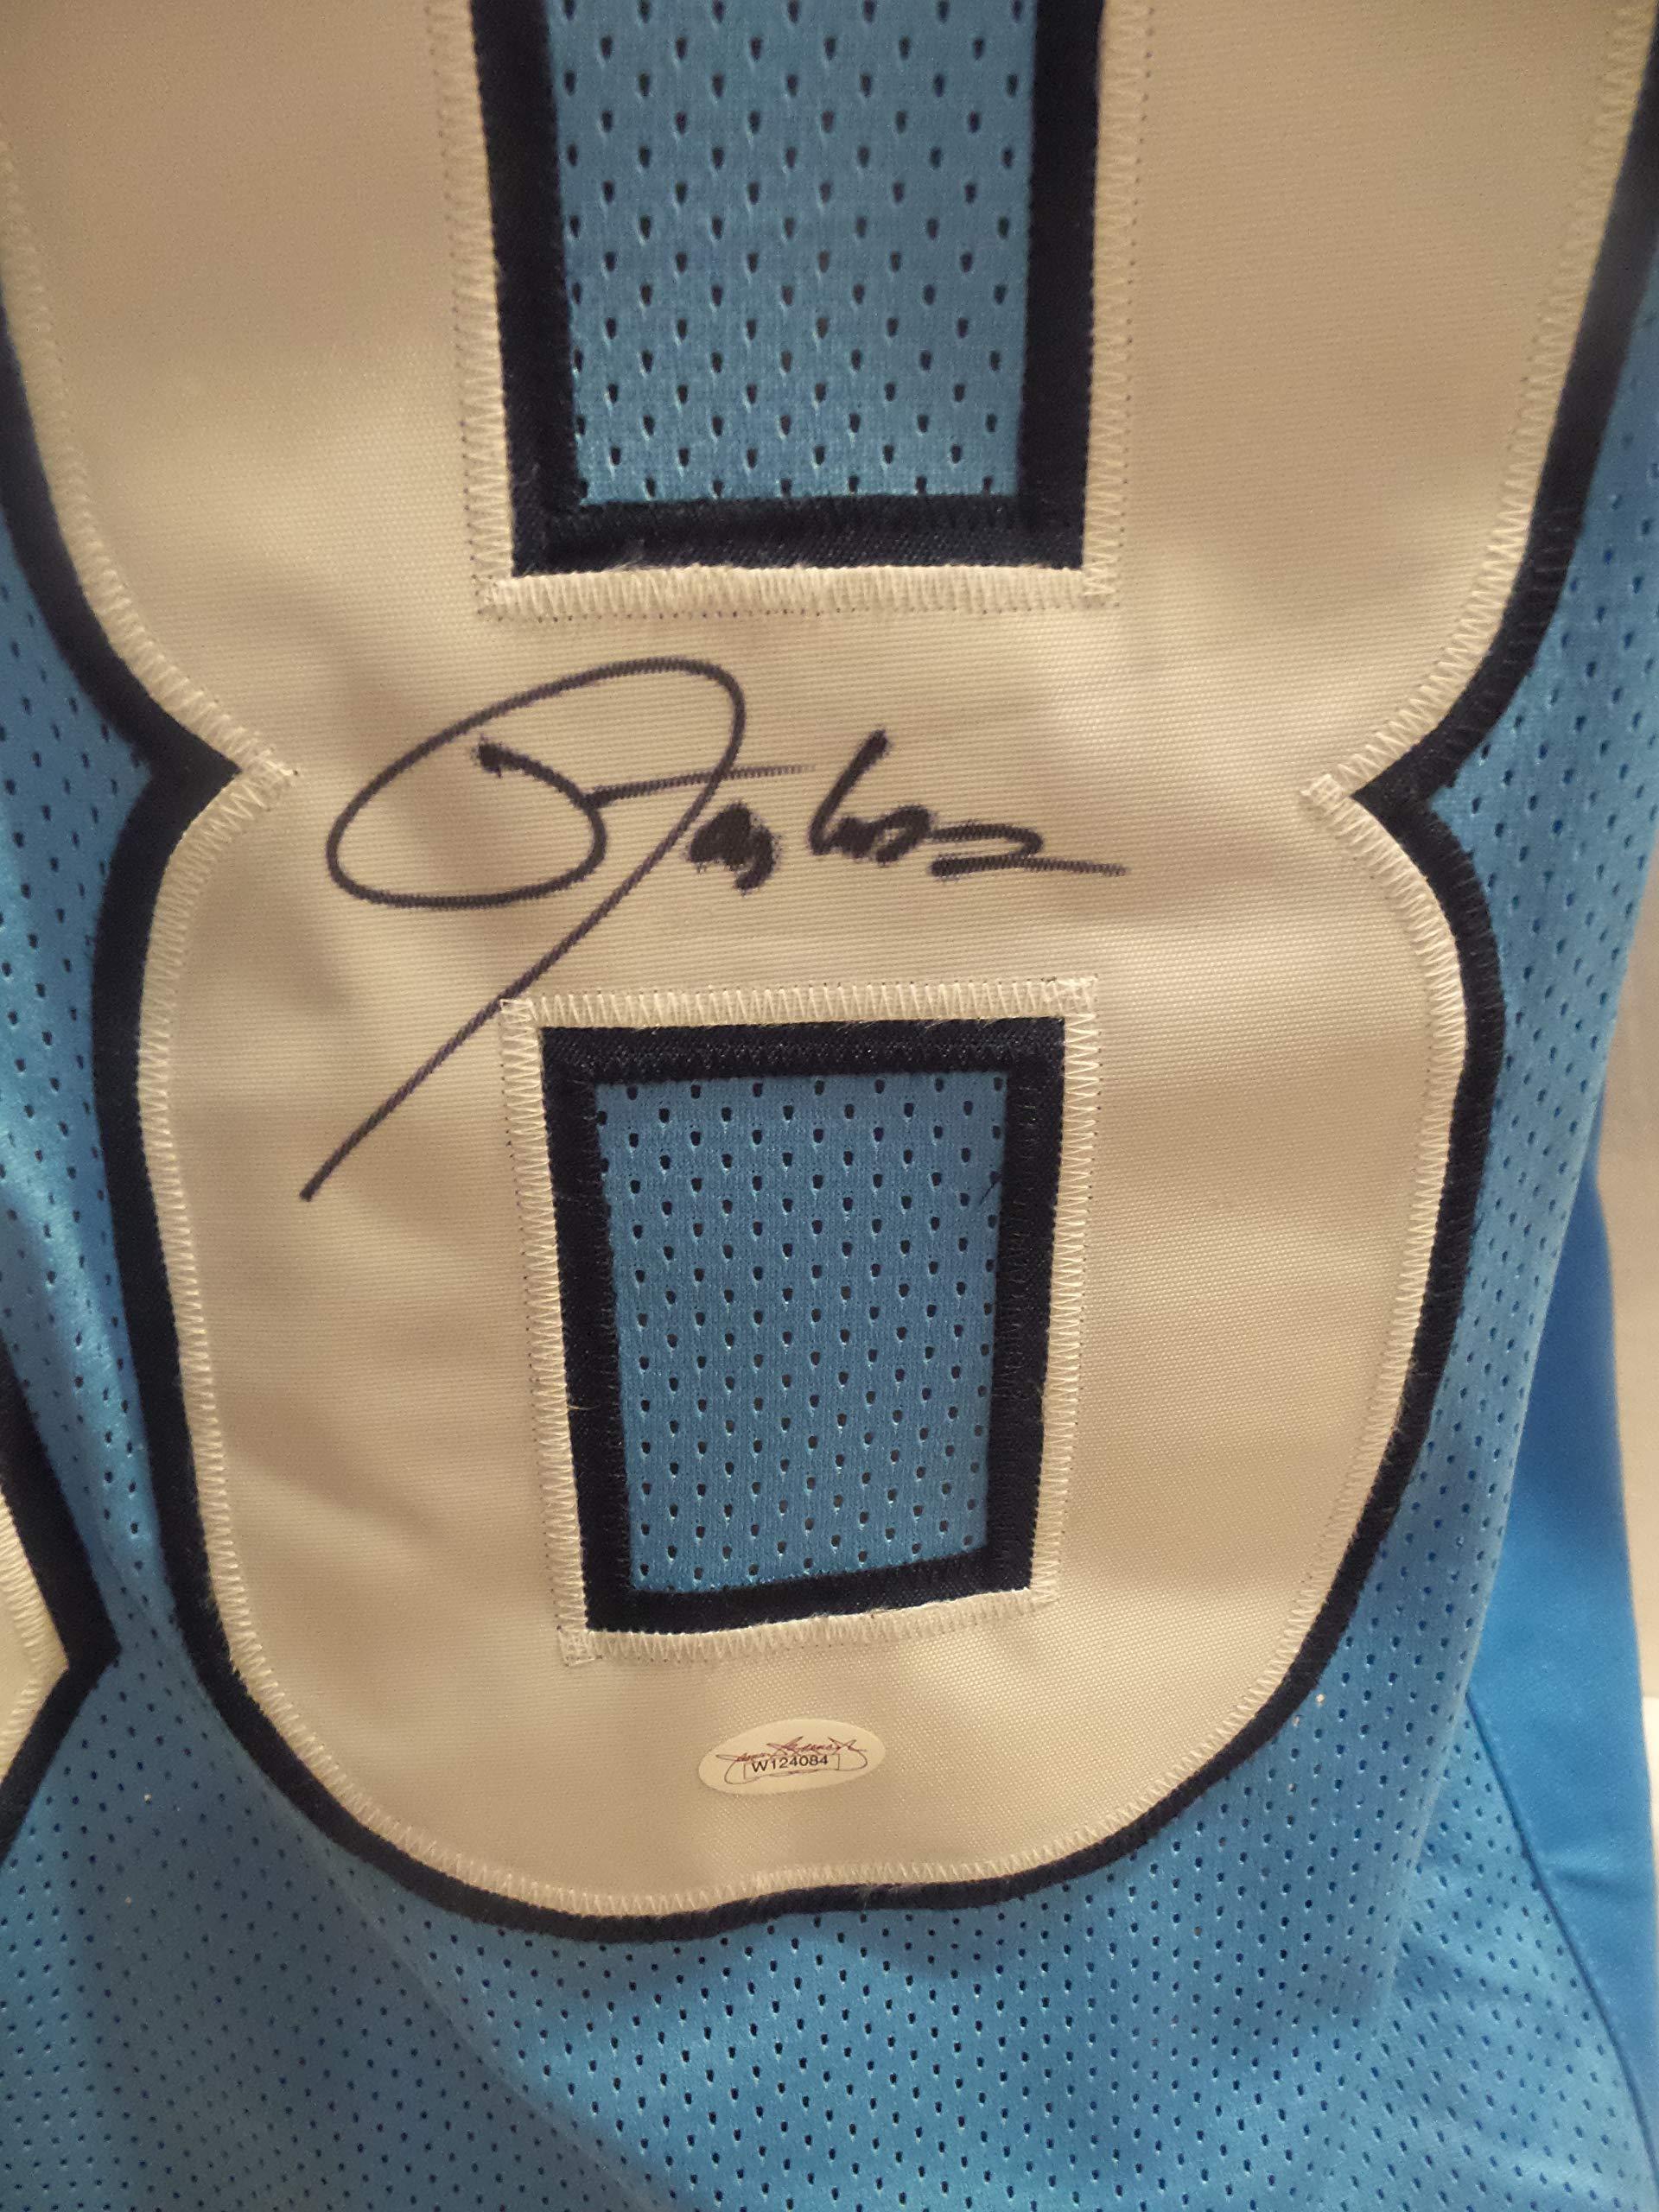 Lawrence Taylor Signed College:North Carolina Autographed Jersey Novelty Custom Jersey JSA